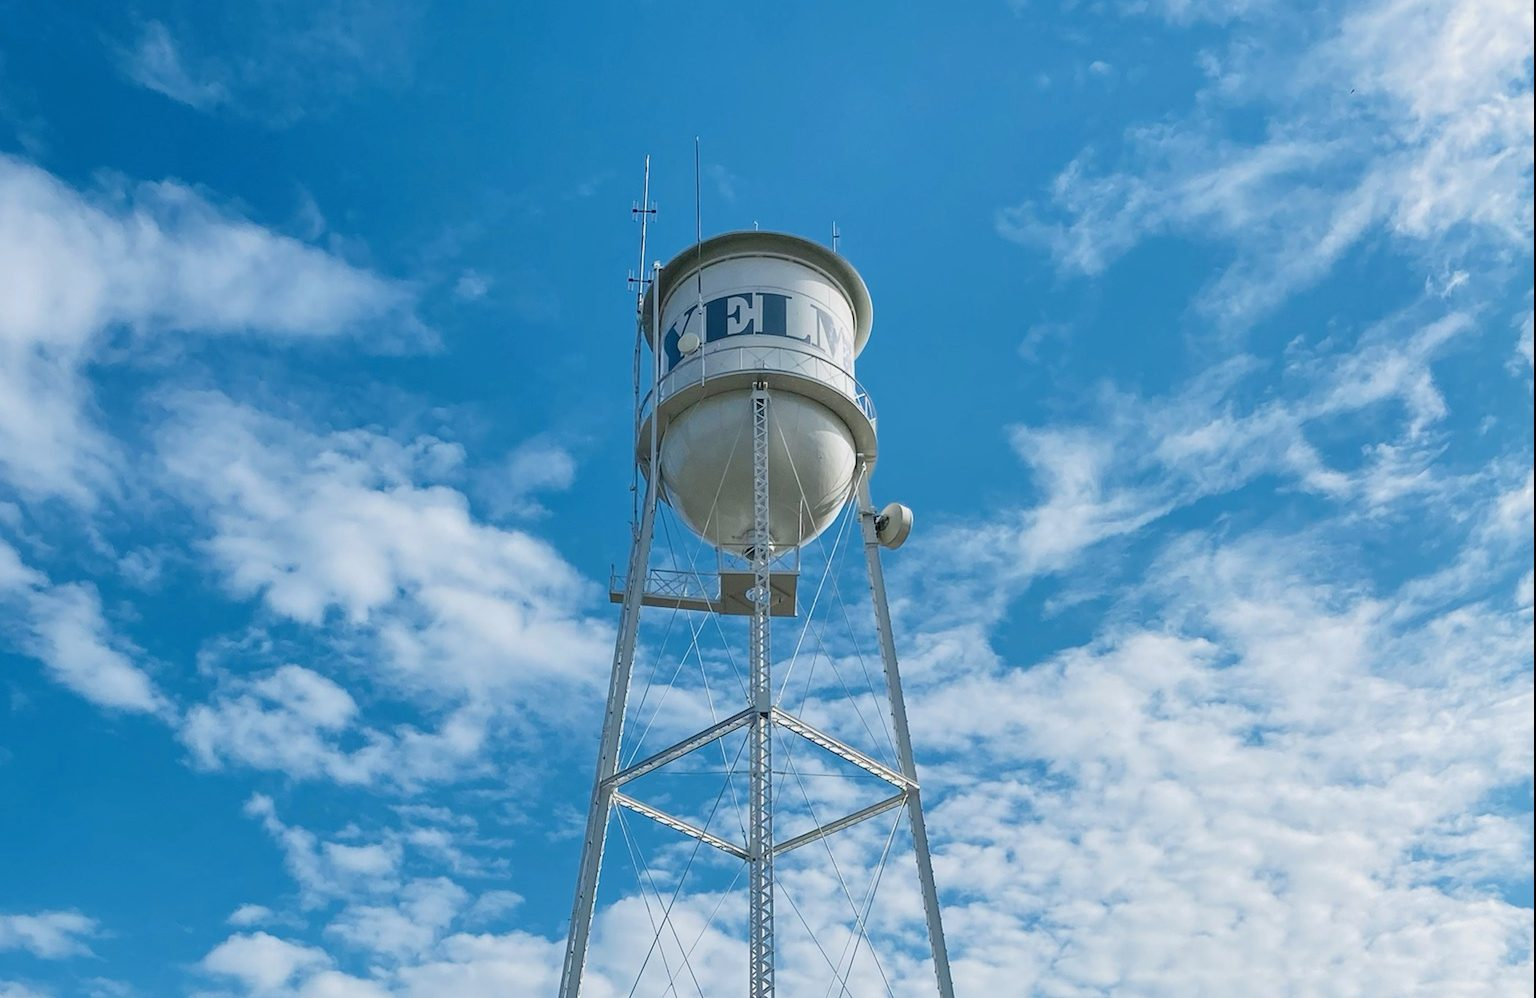 https://www.thurstontalk.com/wp-content/uploads/2021/10/Yelm-Water-Tower-After-Renovation-e1634925094443.jpg